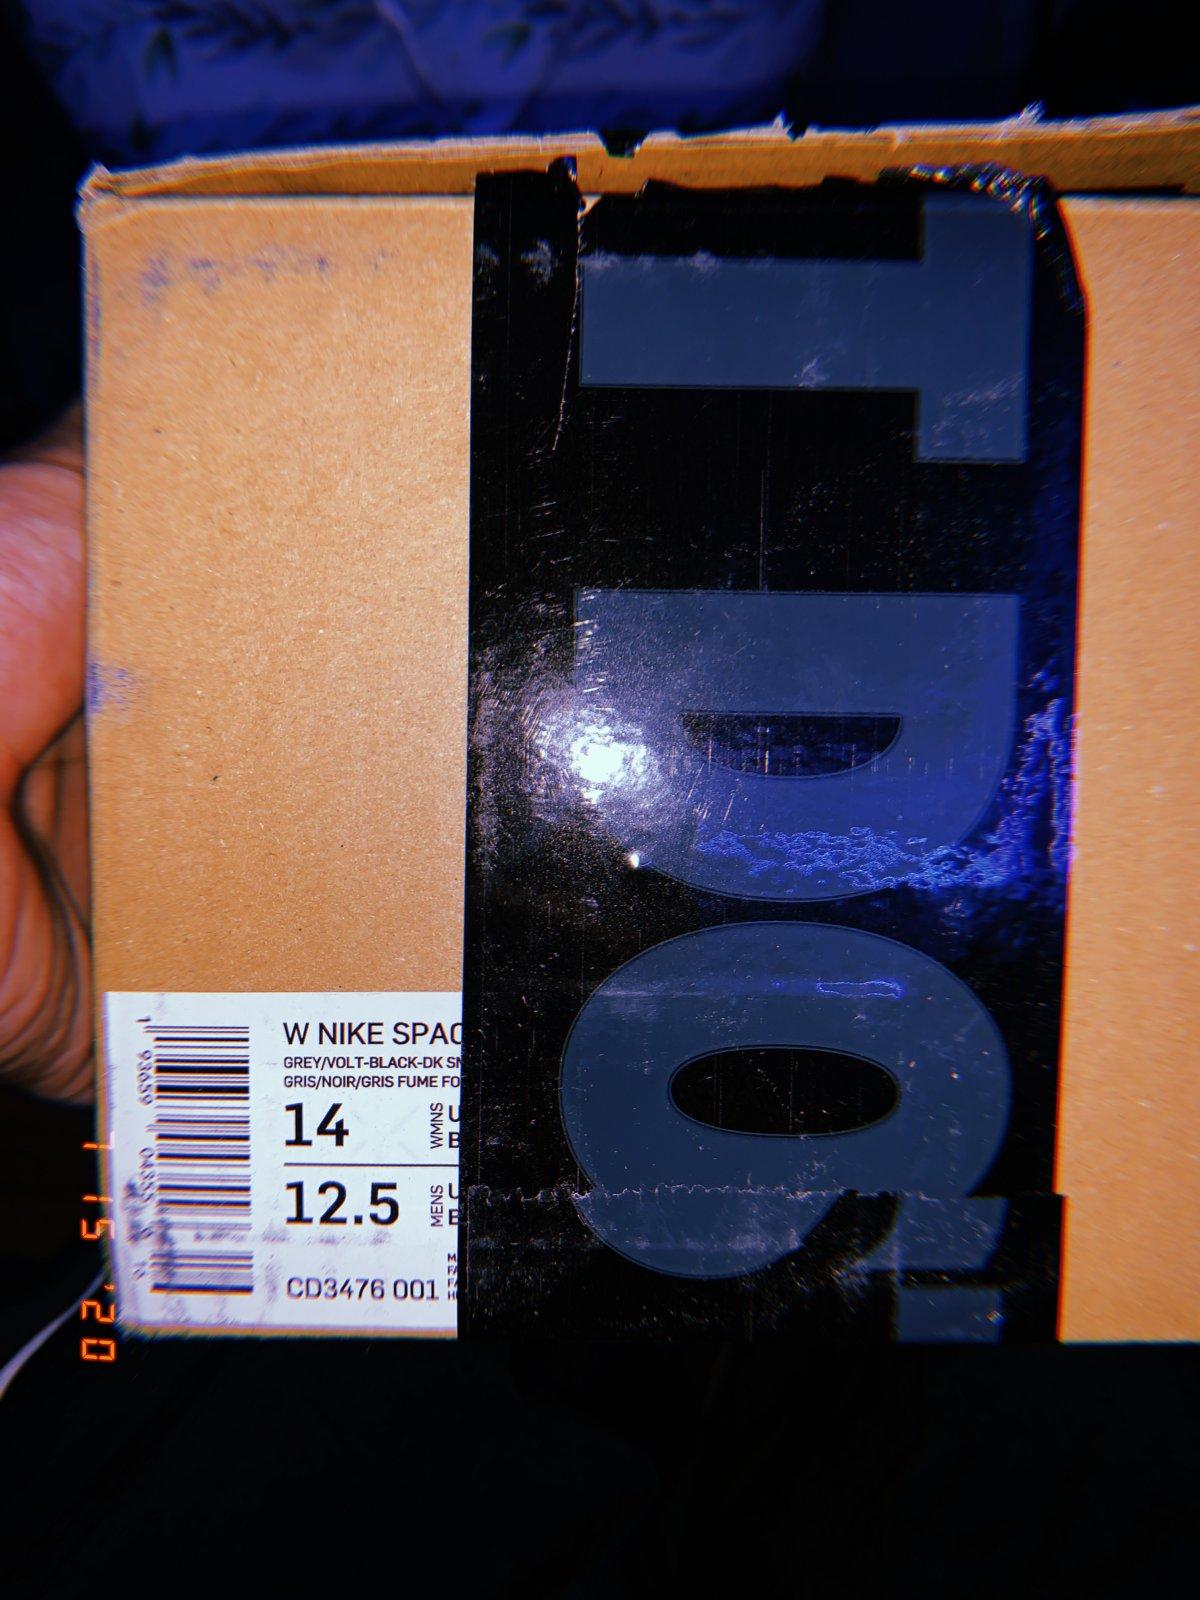 BF3C4D37-CFEA-4555-8933-E3E1ECD8E8DC.jpeg